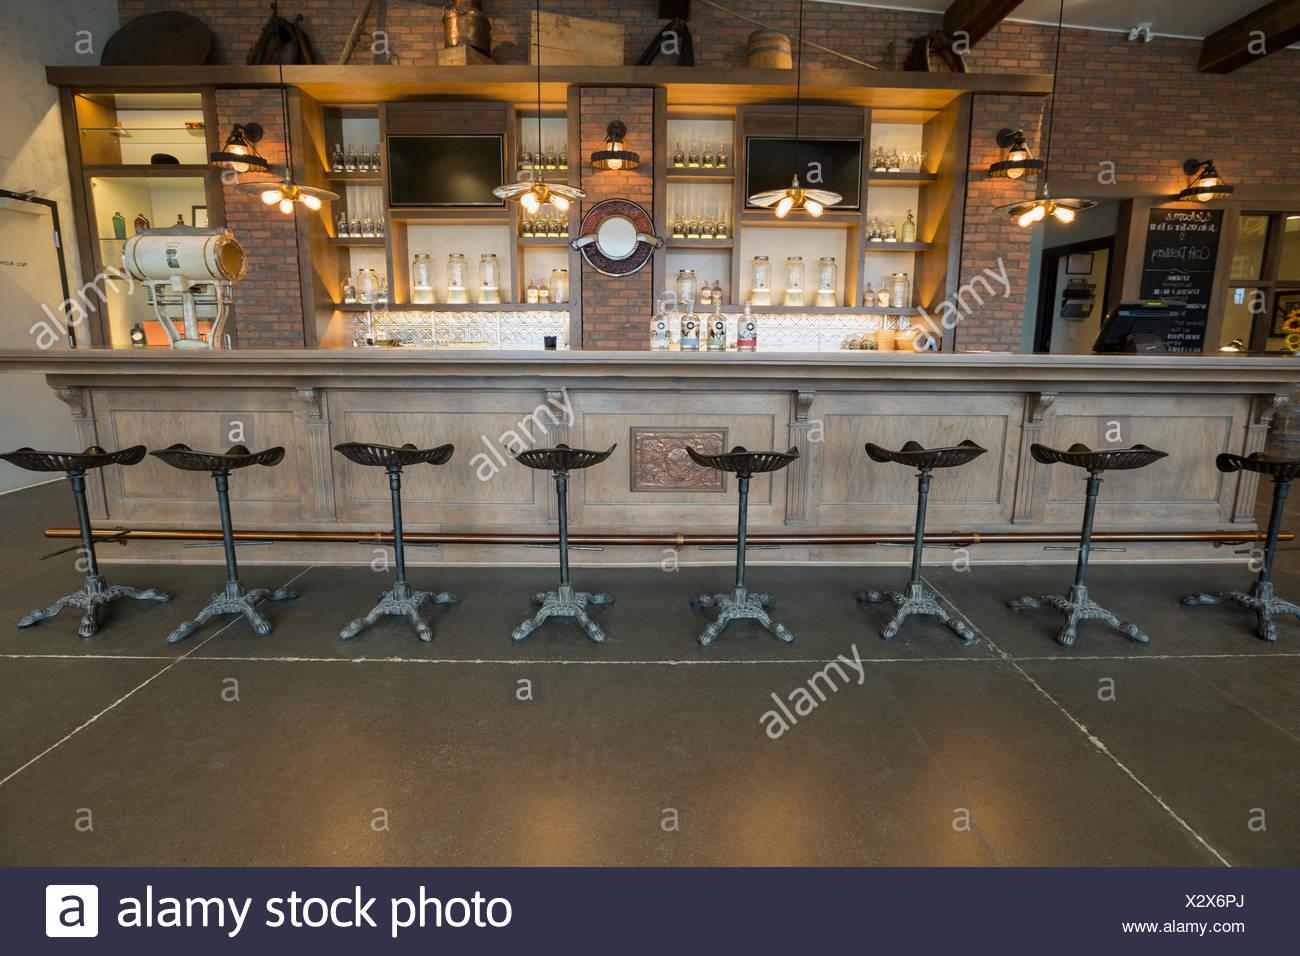 Stools lined along empty distillery bar - Stock Image